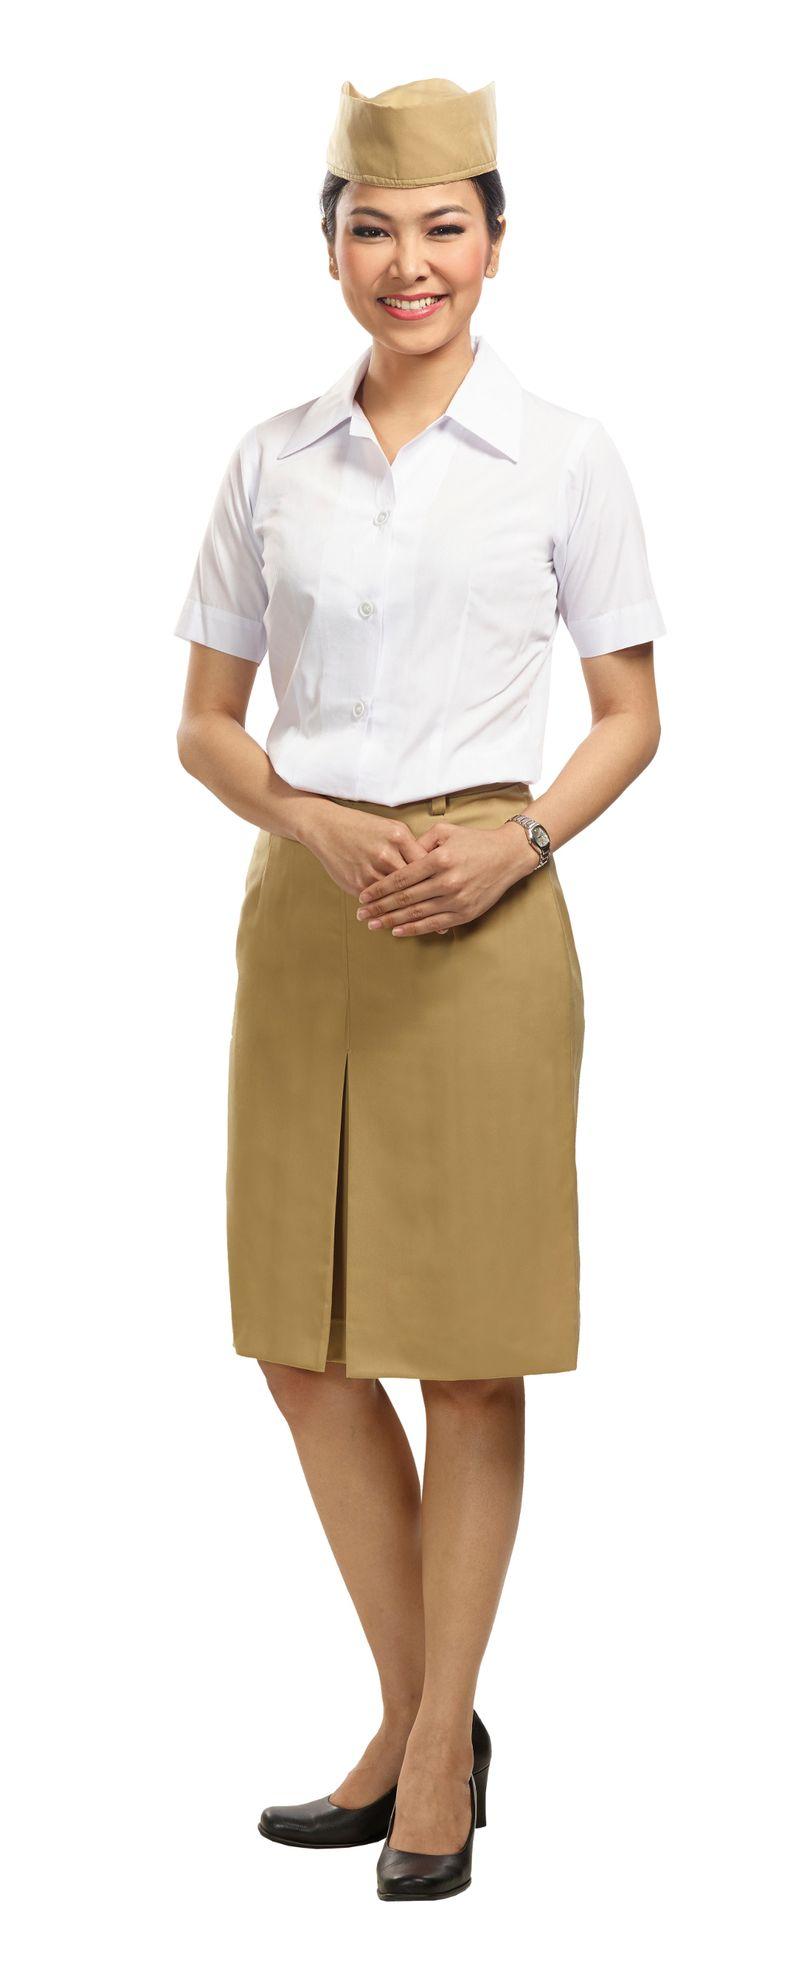 Berdiri sejak Januari 1949, inilah seragam pertama pramugari Garuda Indonesia. Hanya kemeja putih, rok cokelat dan topi cokelat. Sekilas, mirip seperti pakaian yang dikenakan para pejuang kemerdekaan (dok Garuda Indonesia)